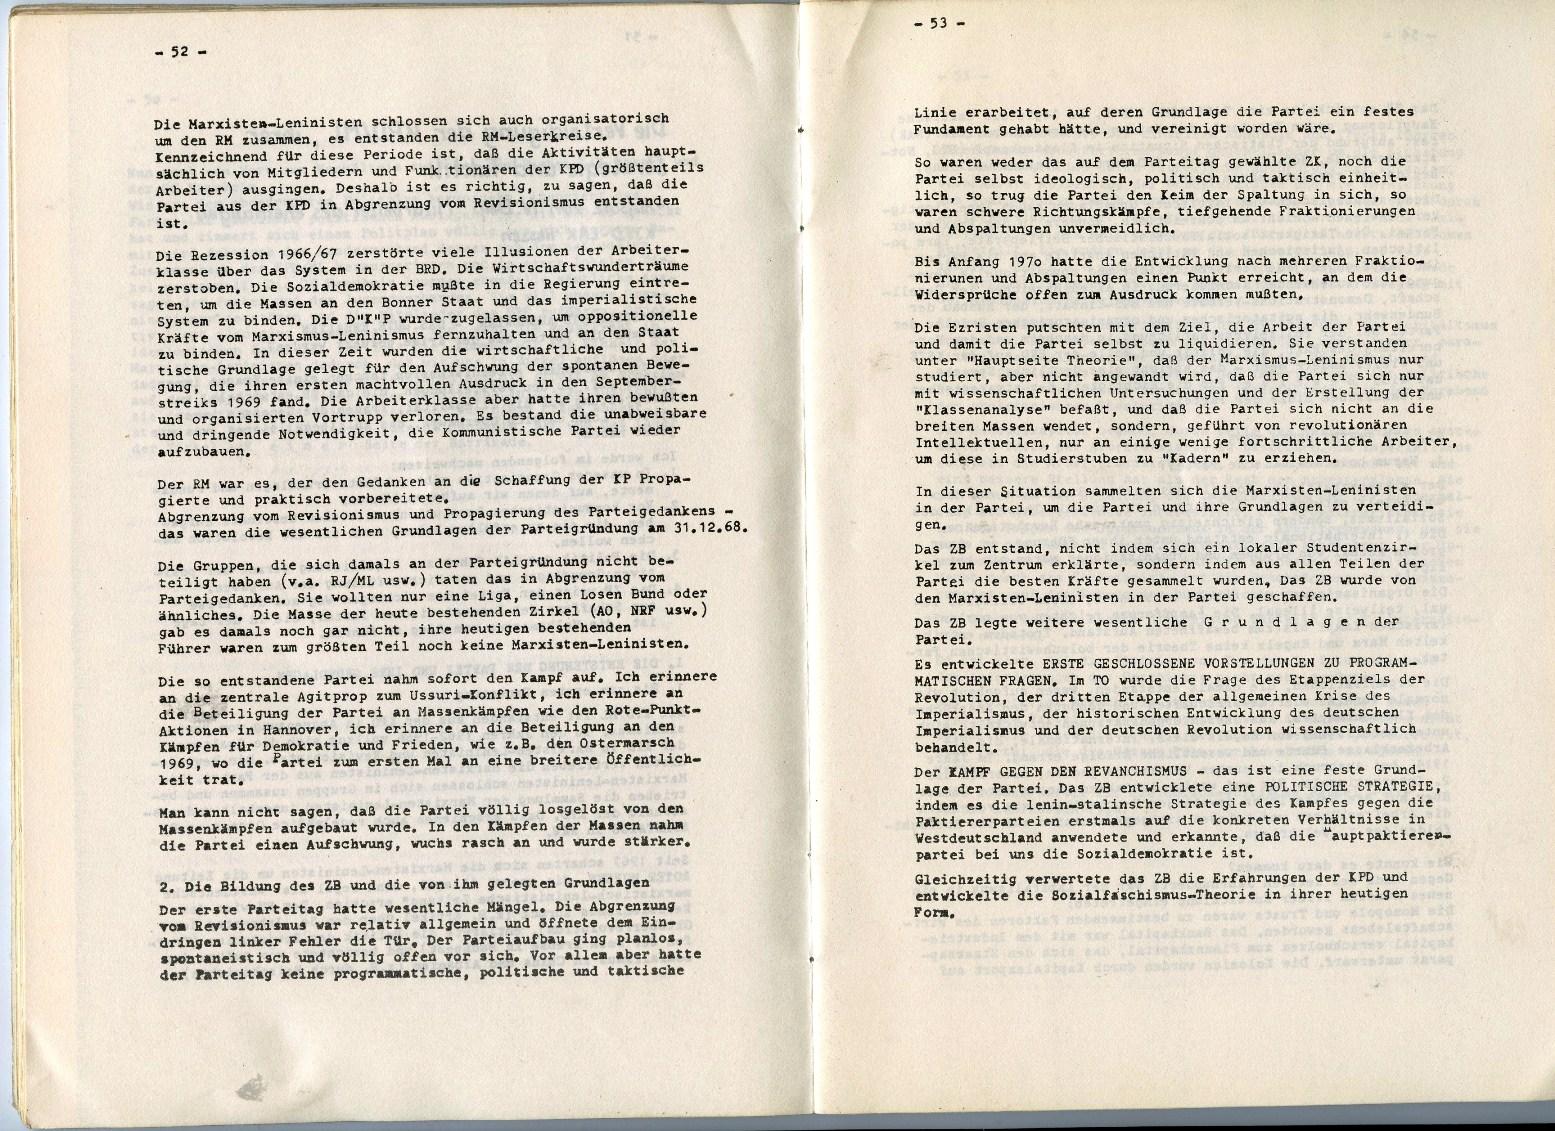 ZB_Universitas_1972_30